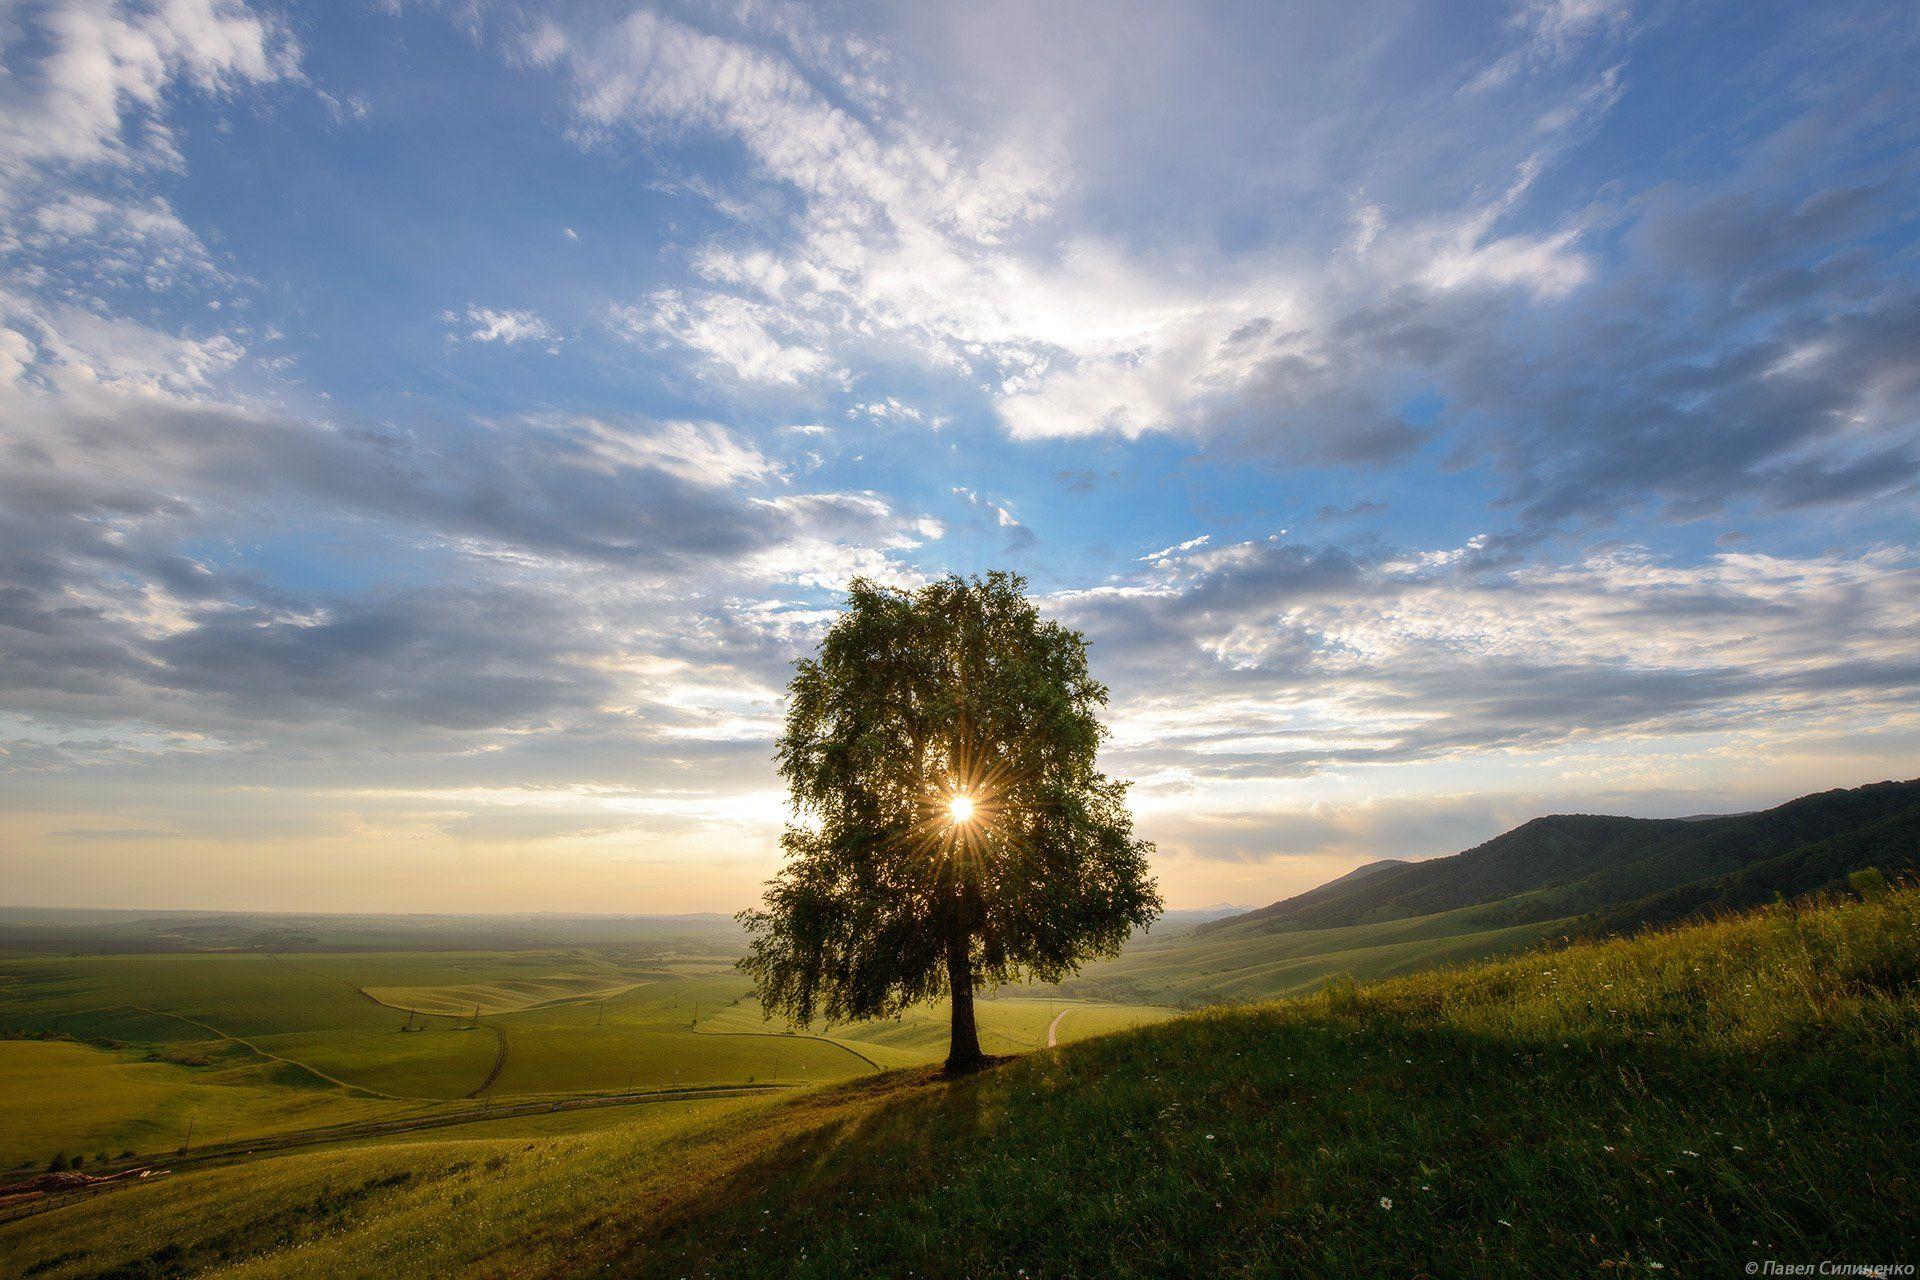 алтай, белокуриха, утро, солнце, долина, одинокое дерево, свет, небо, облака, Павел Силиненко